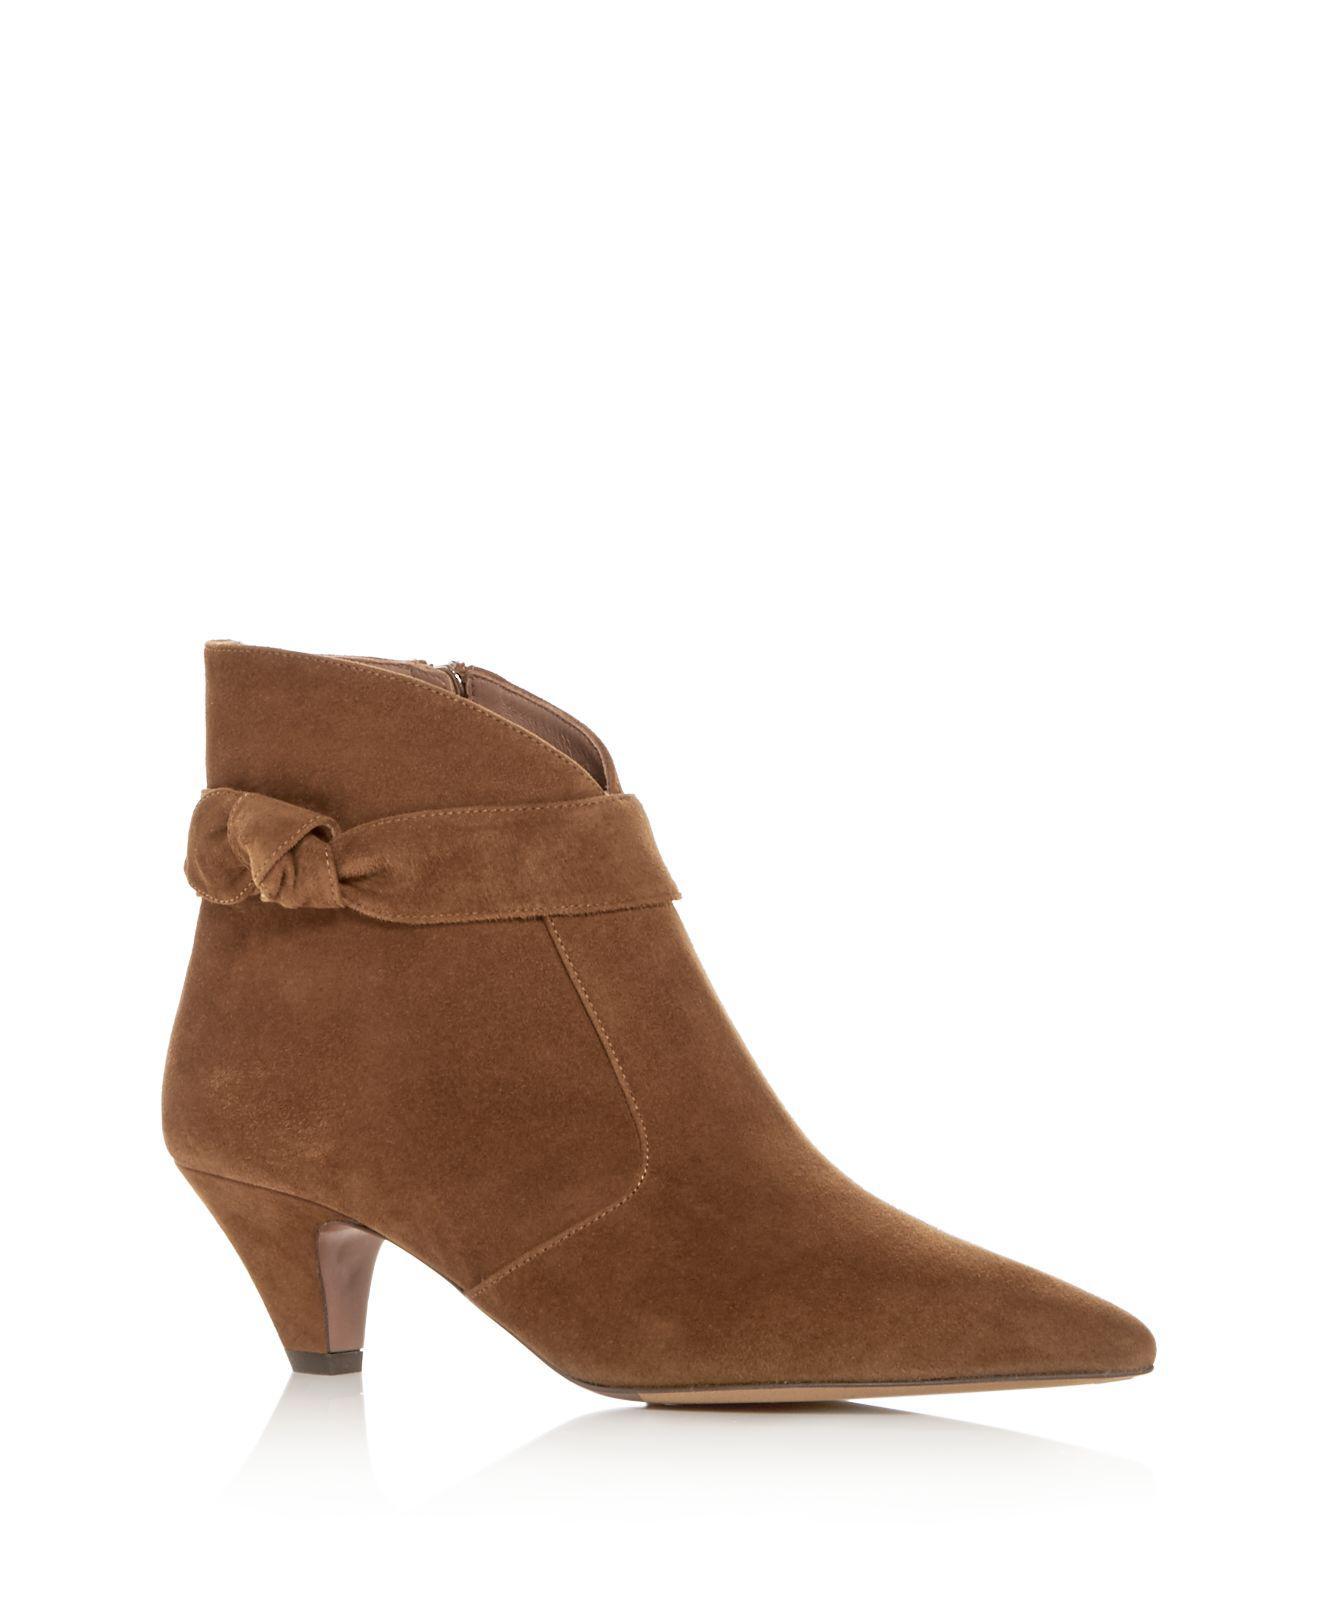 Tabitha Simmons Women's Nixie Leather Kitten Heel Pointed Toe Booties 25FbEGk